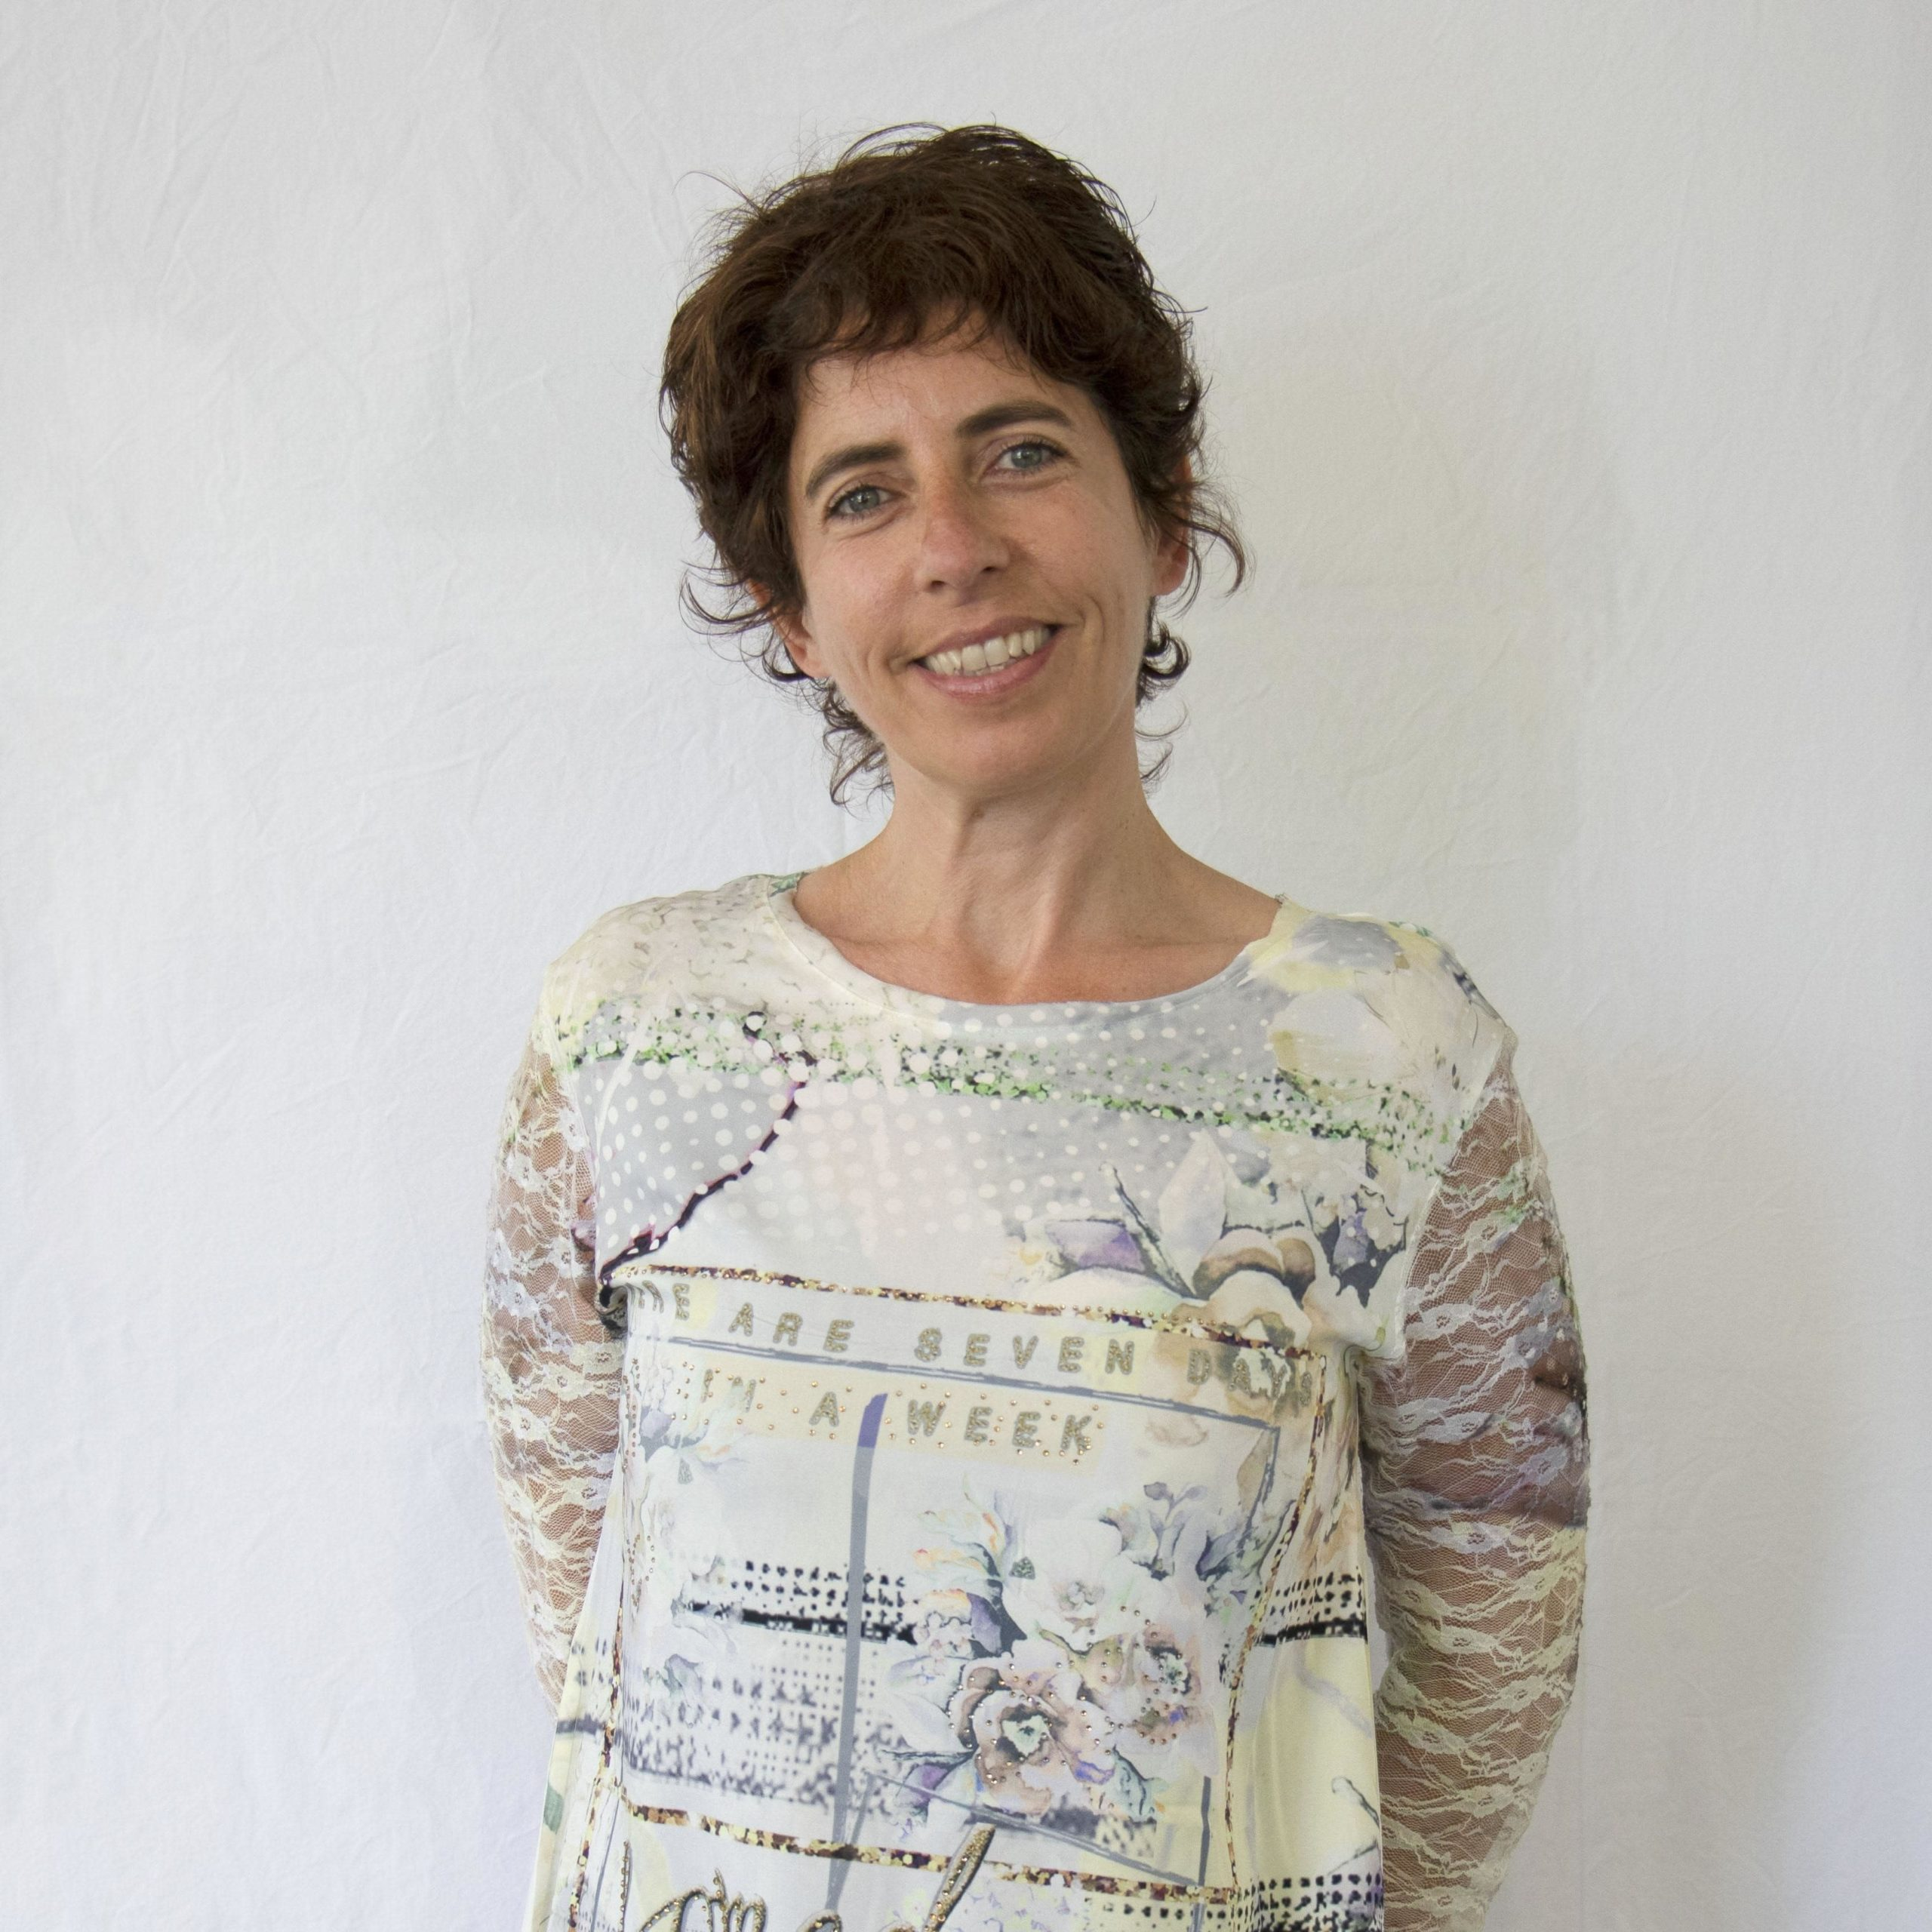 Francesca Danielis